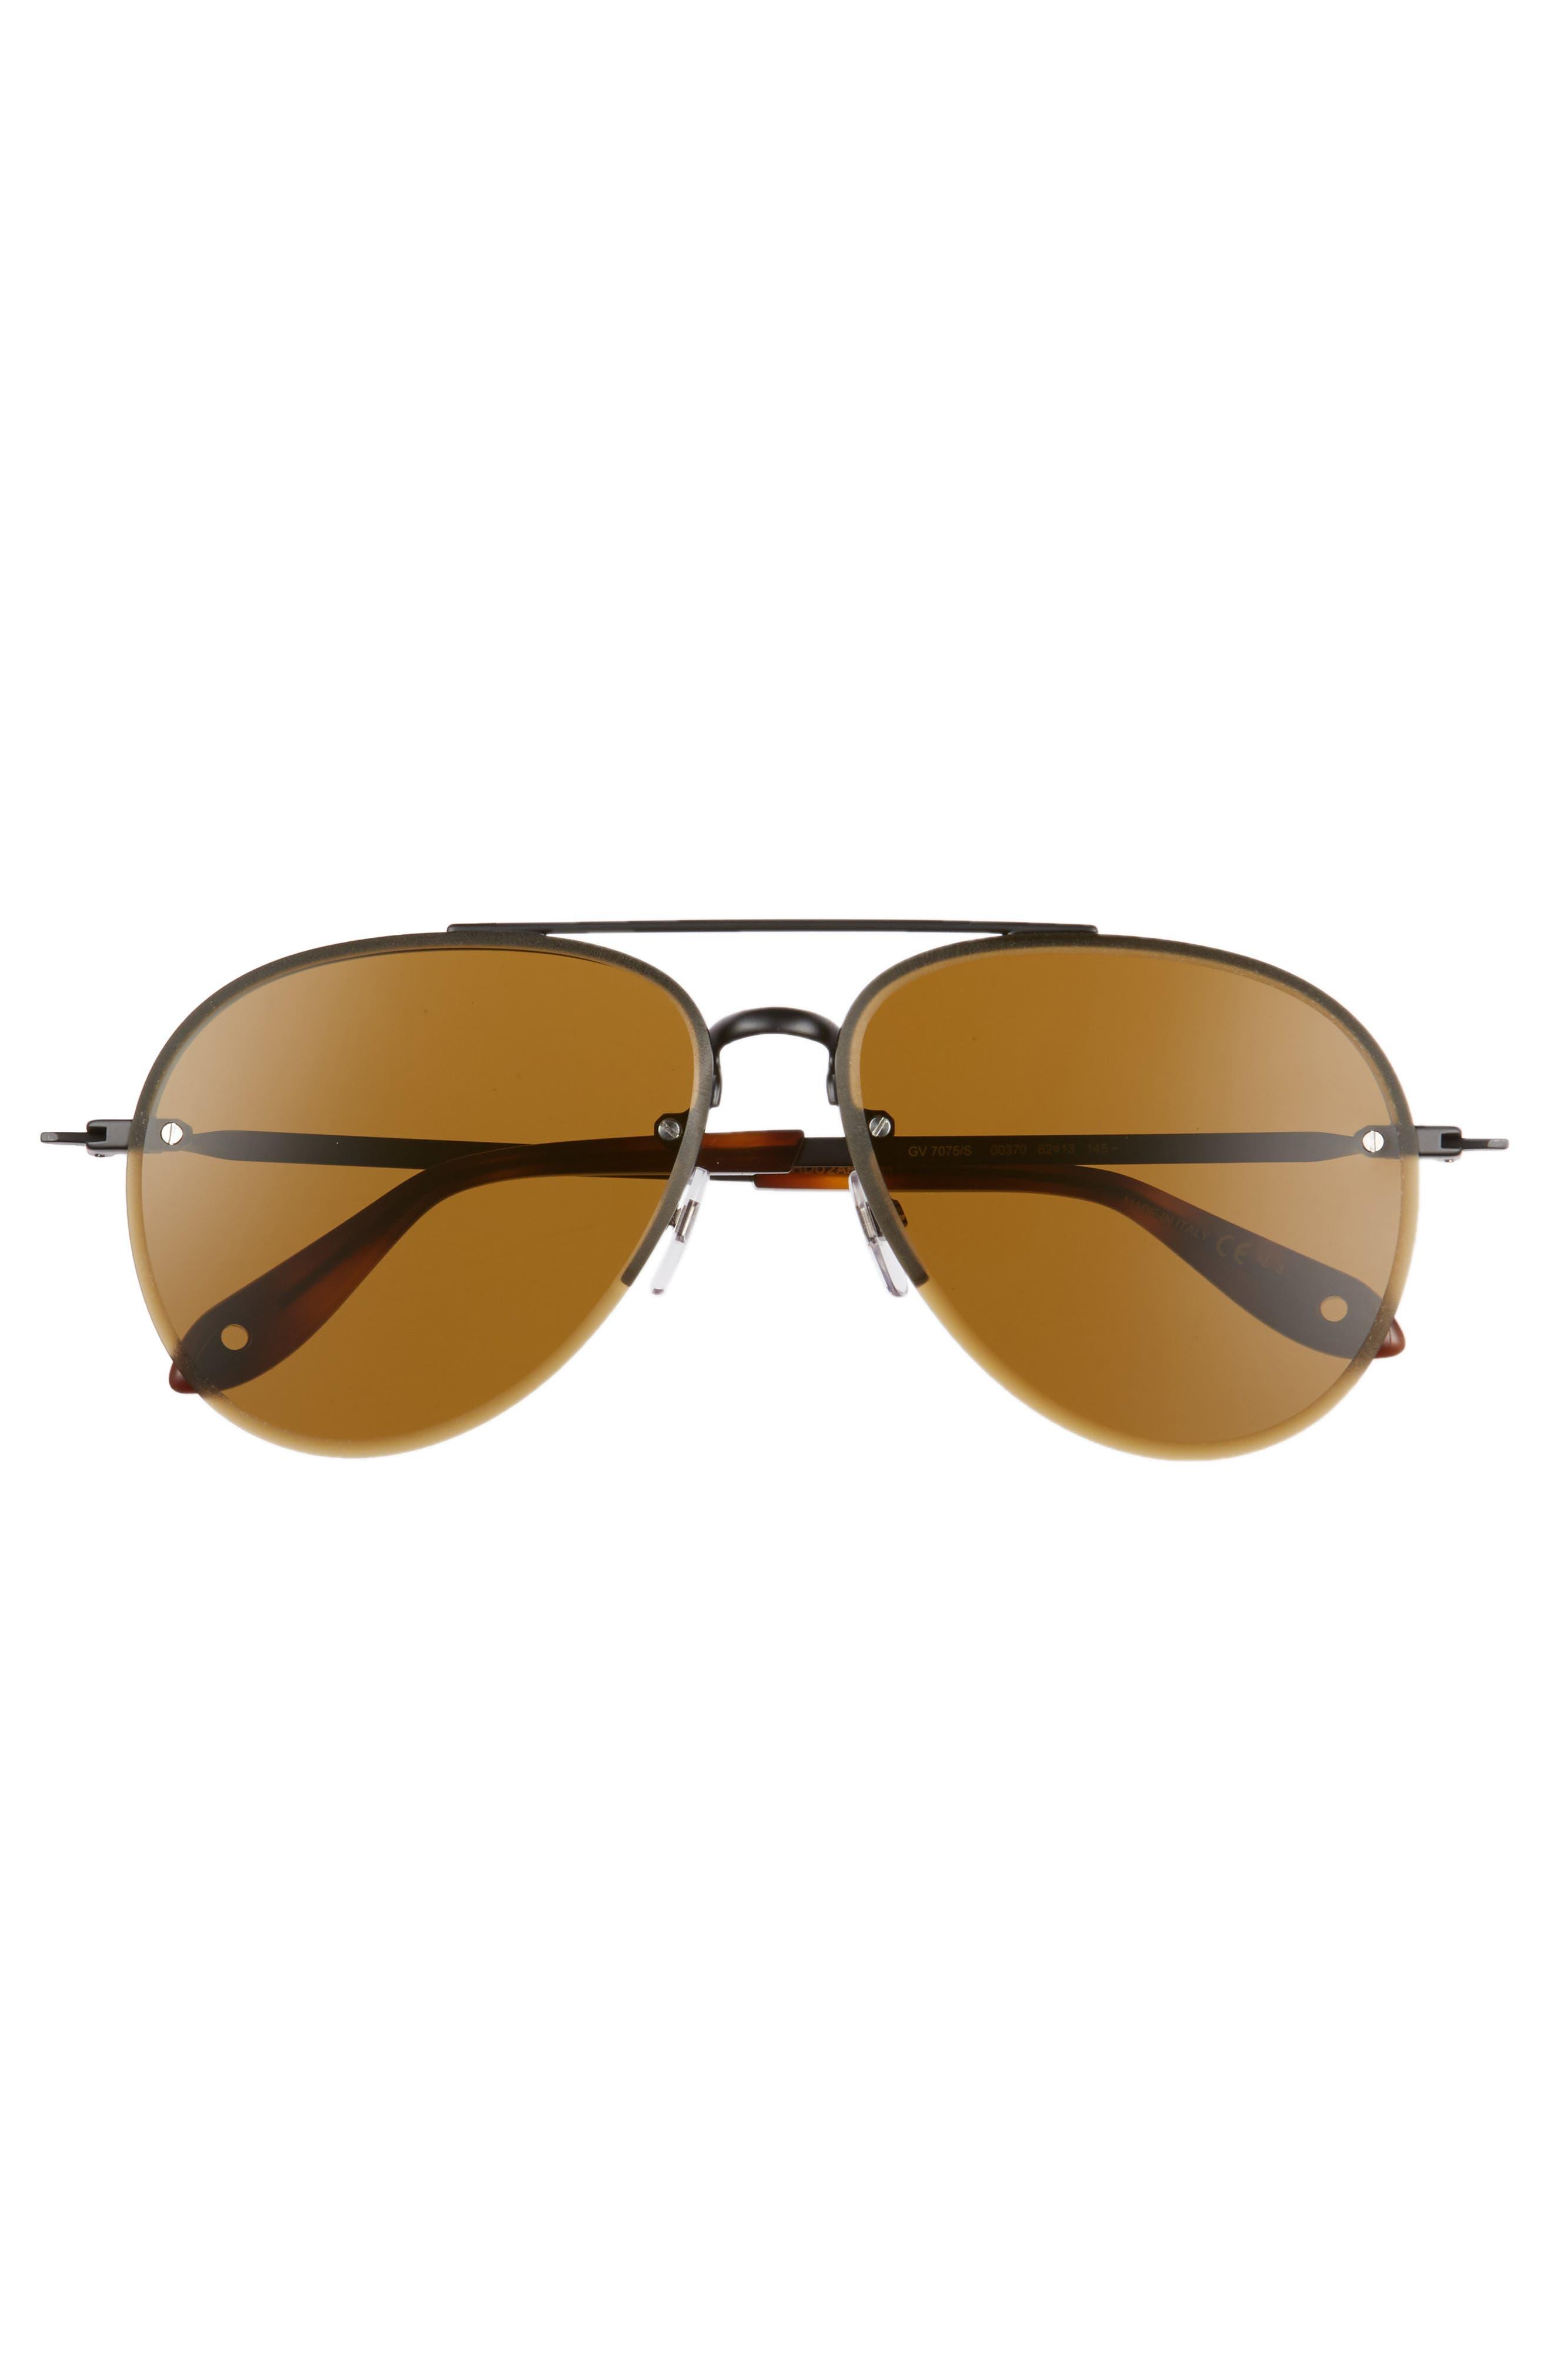 62mm Oversize Aviator Sunglasses,                             Alternate thumbnail 3, color,                             001